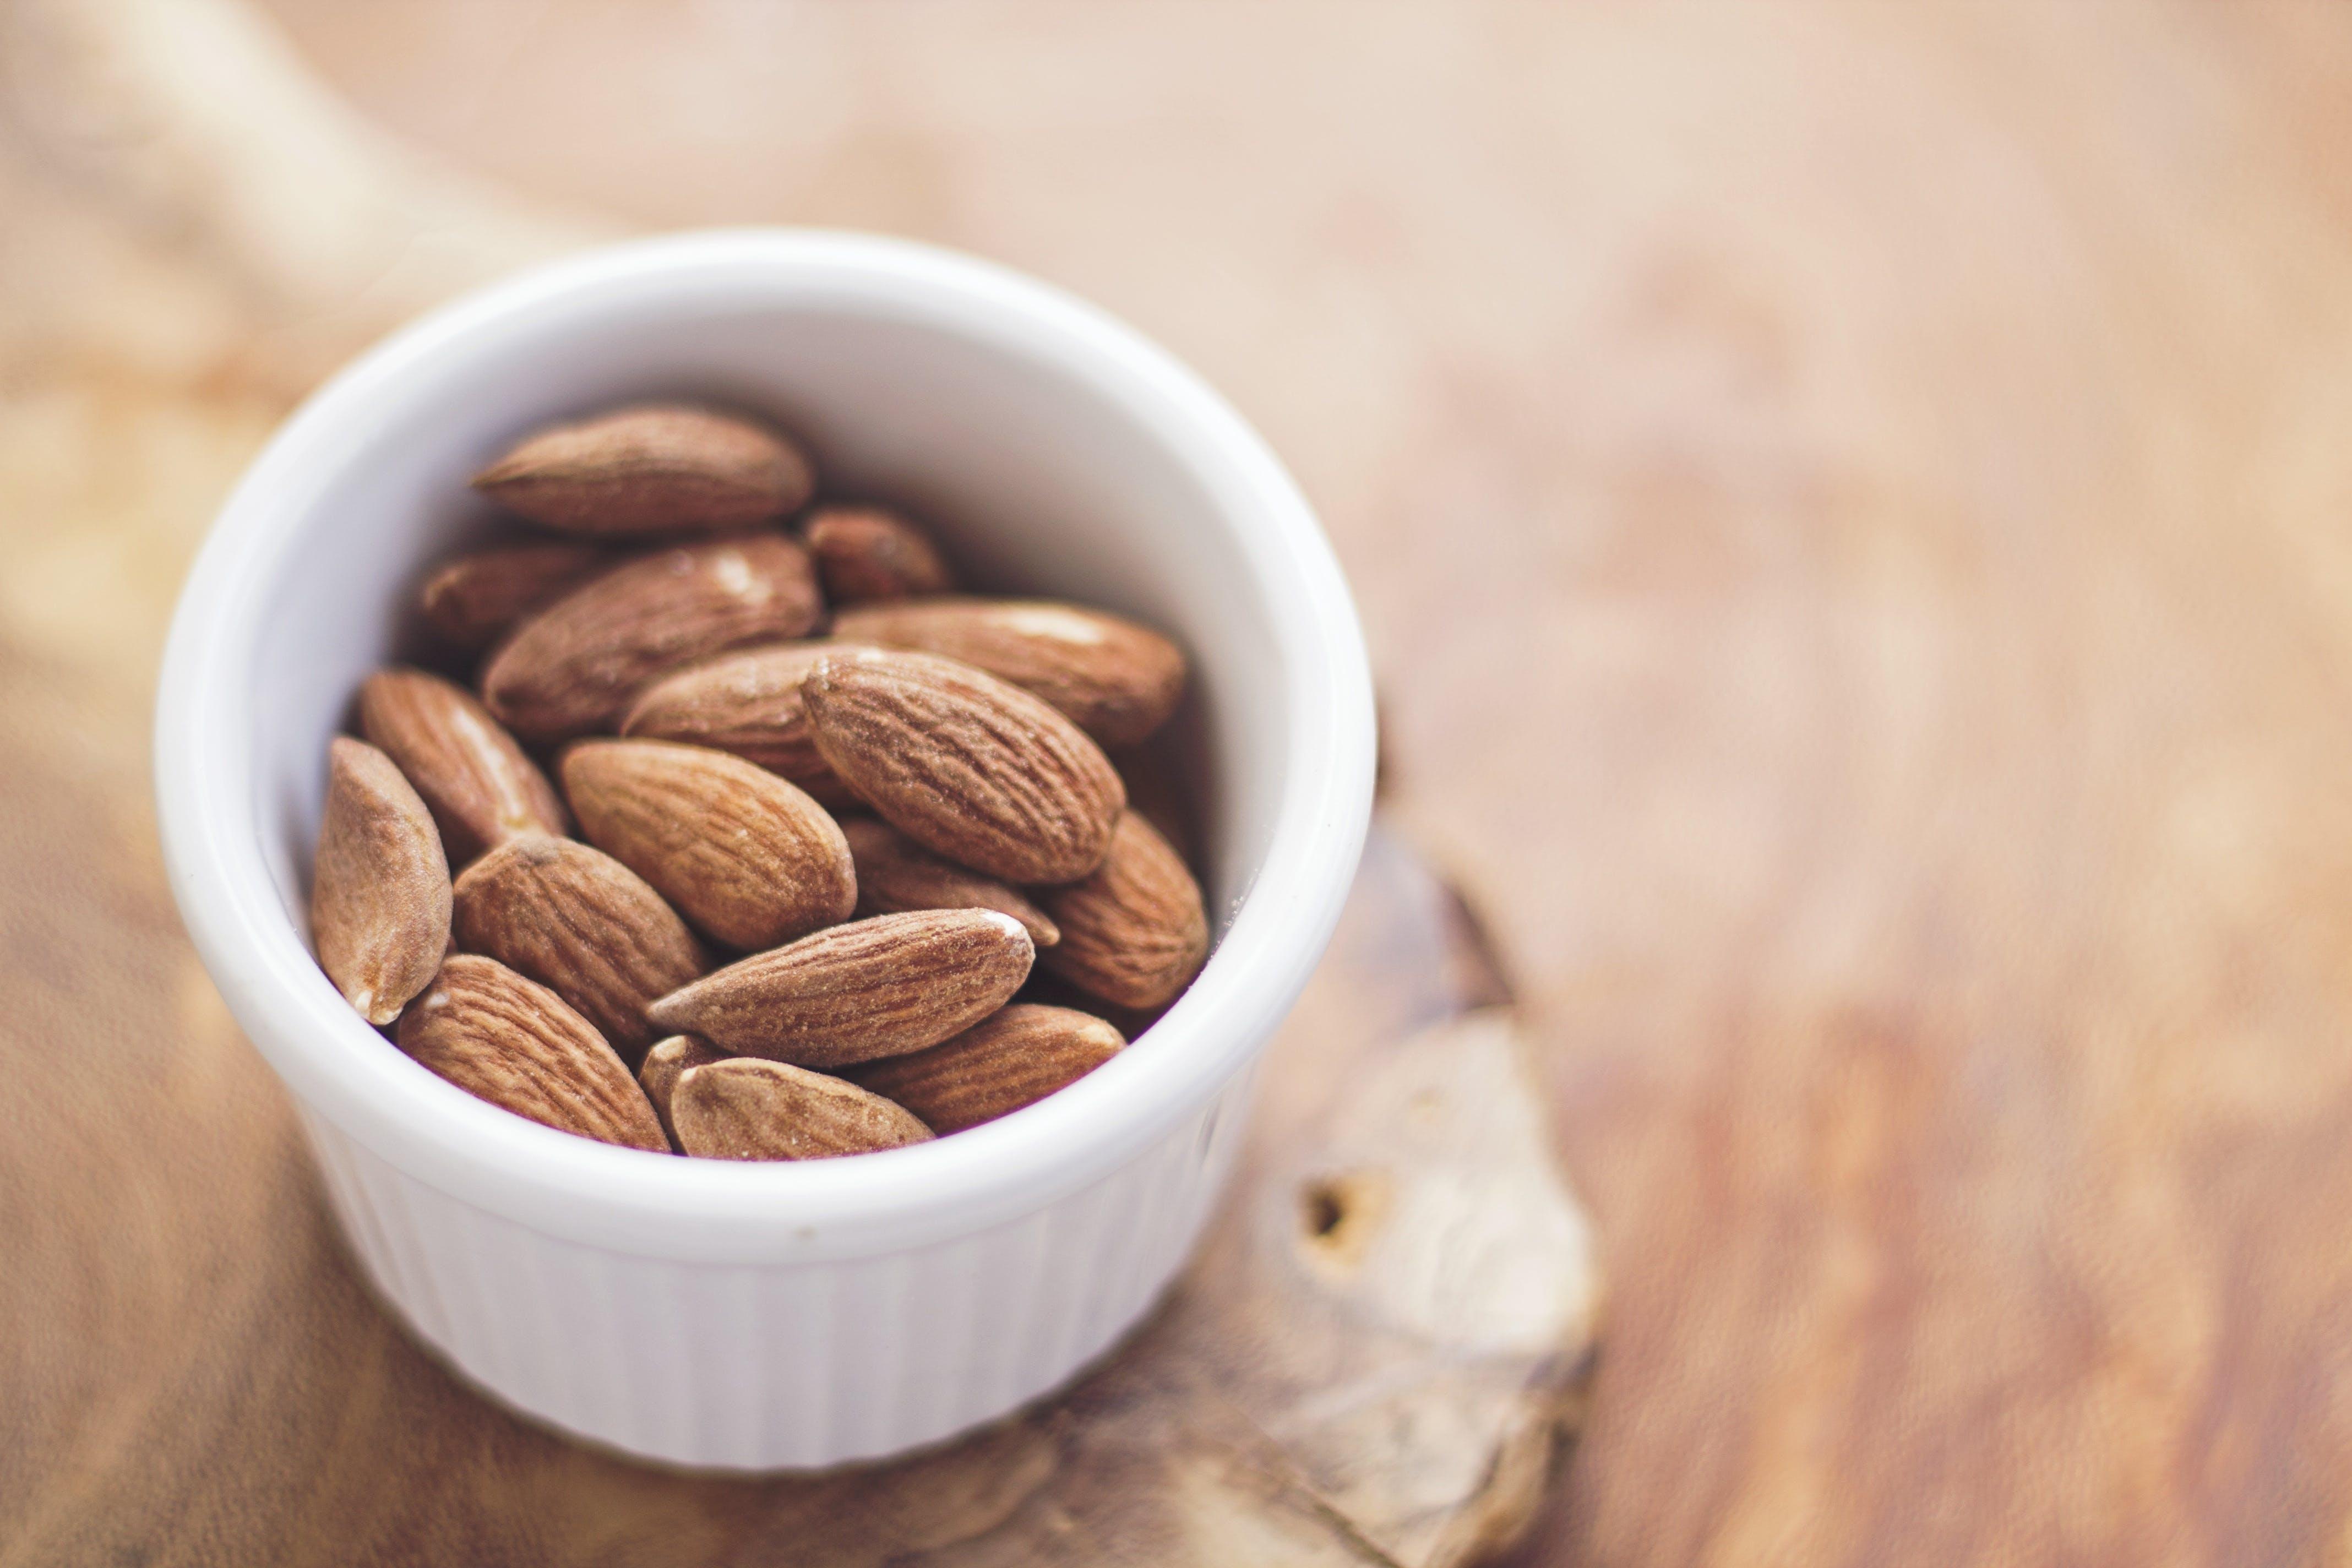 Brown Nuts in White Ceramic Bowl